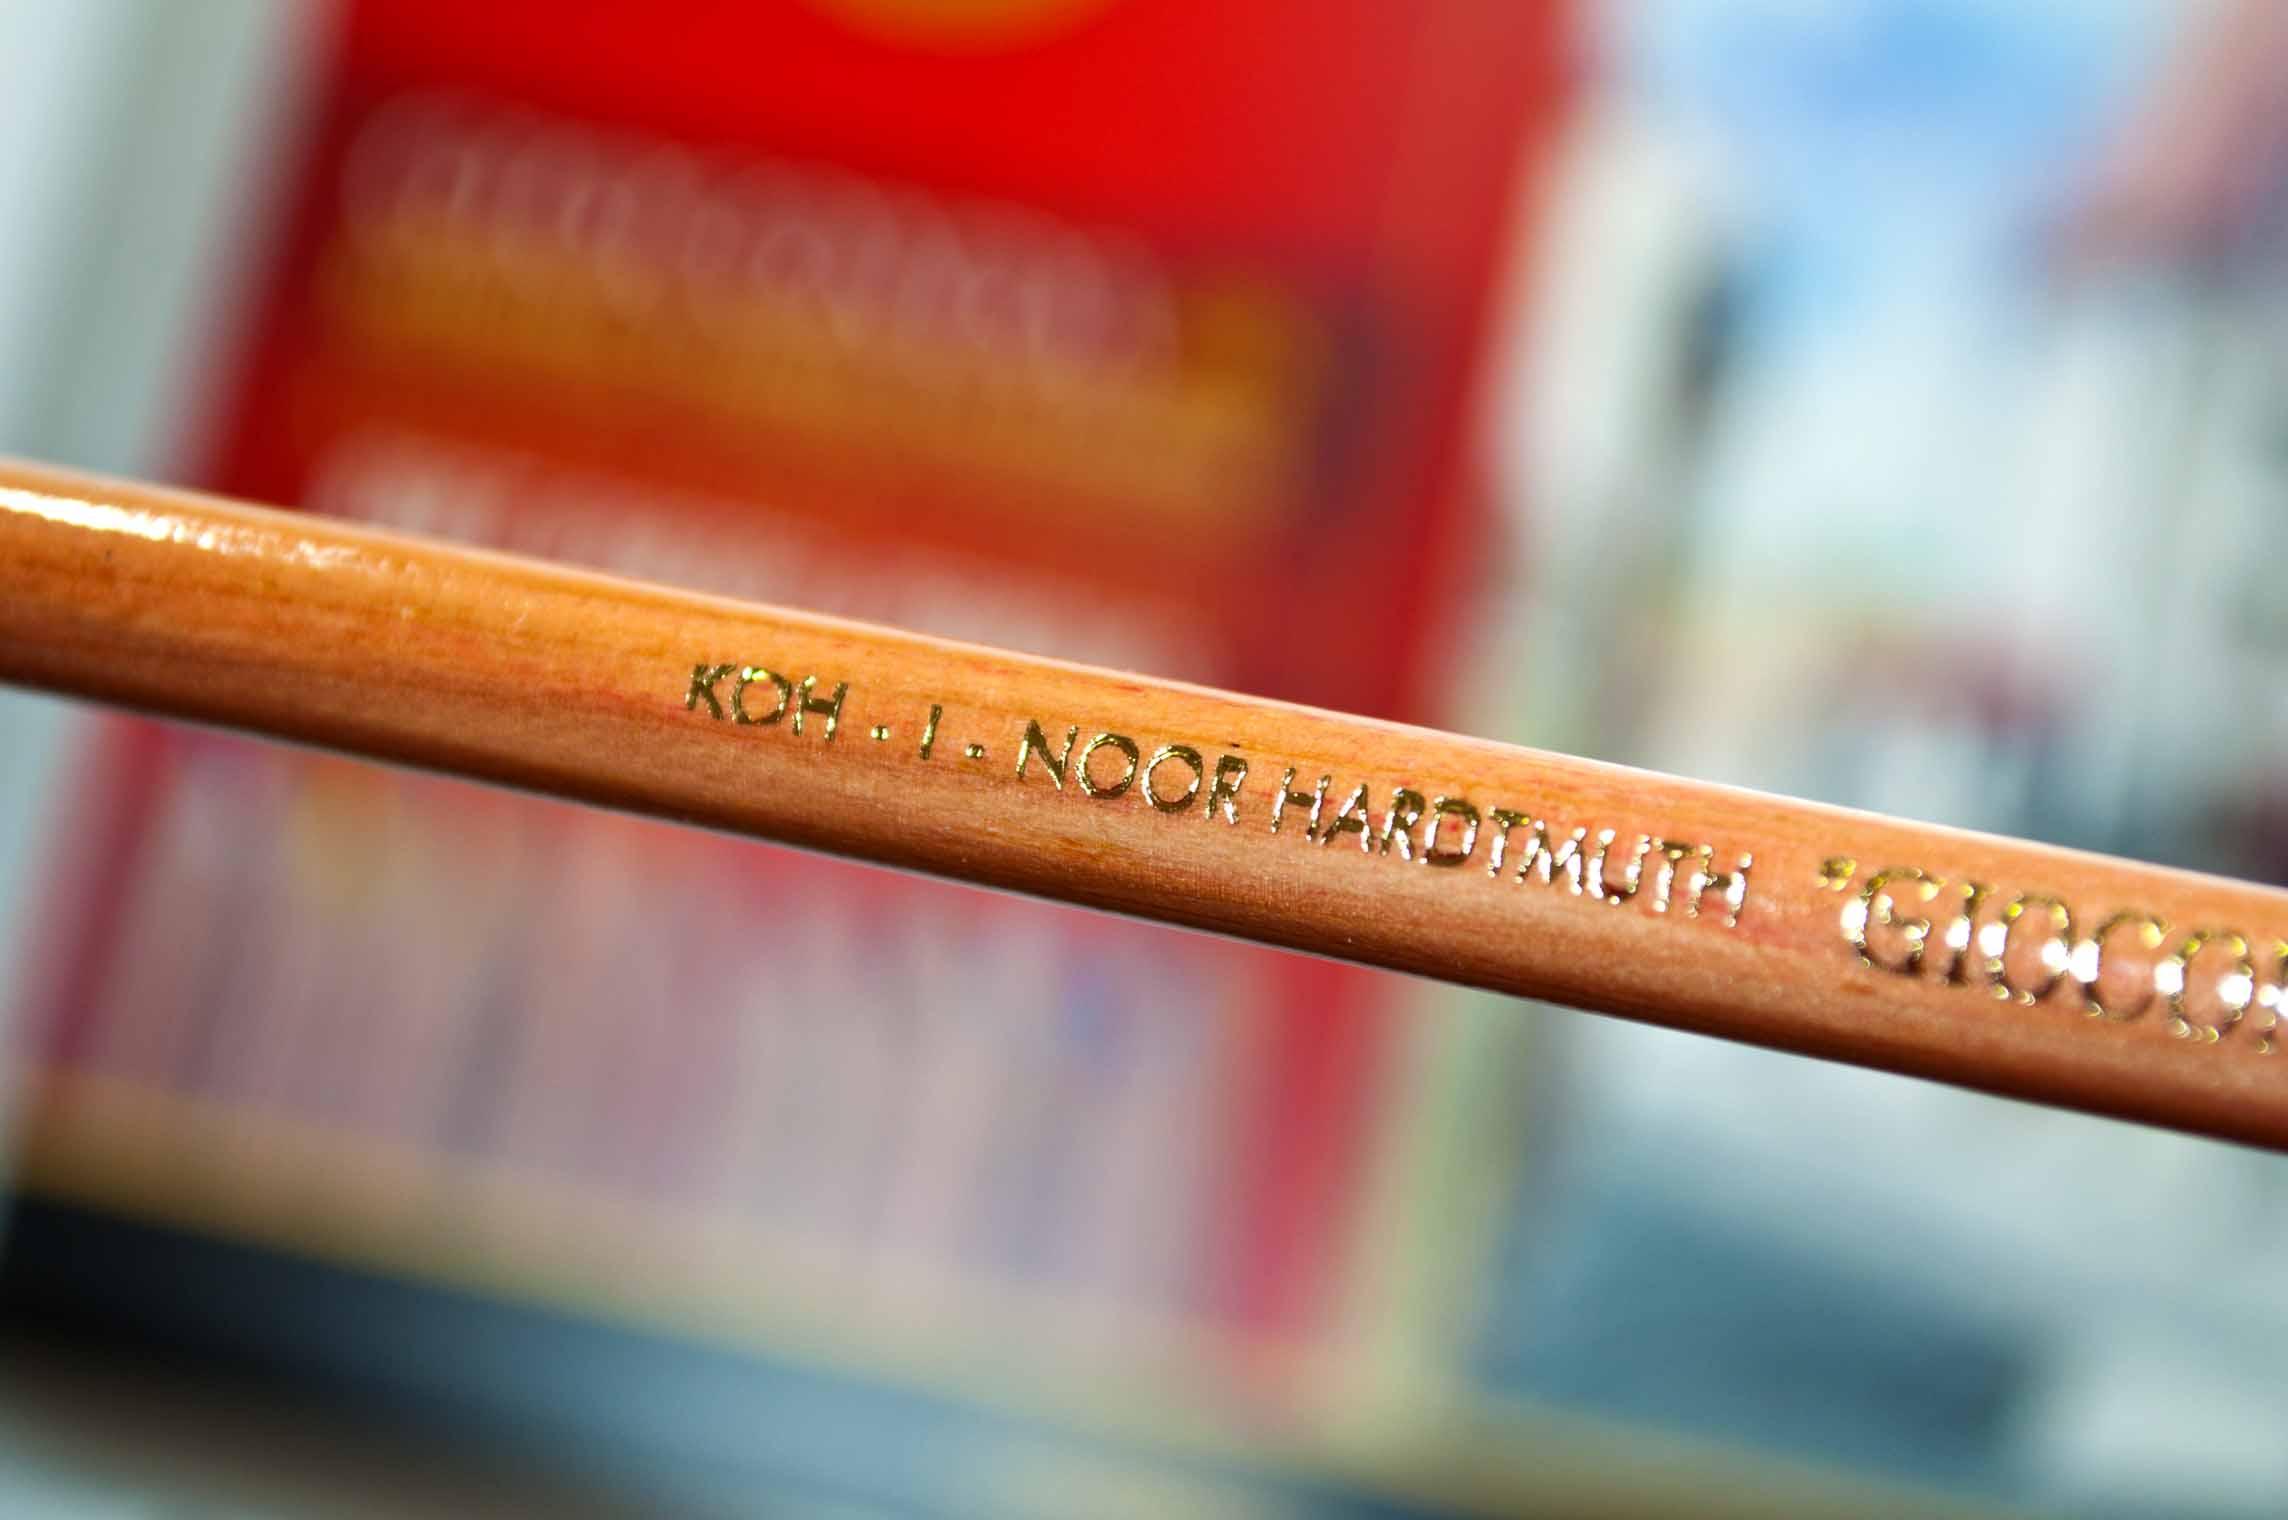 kohinoor on barrel.jpg